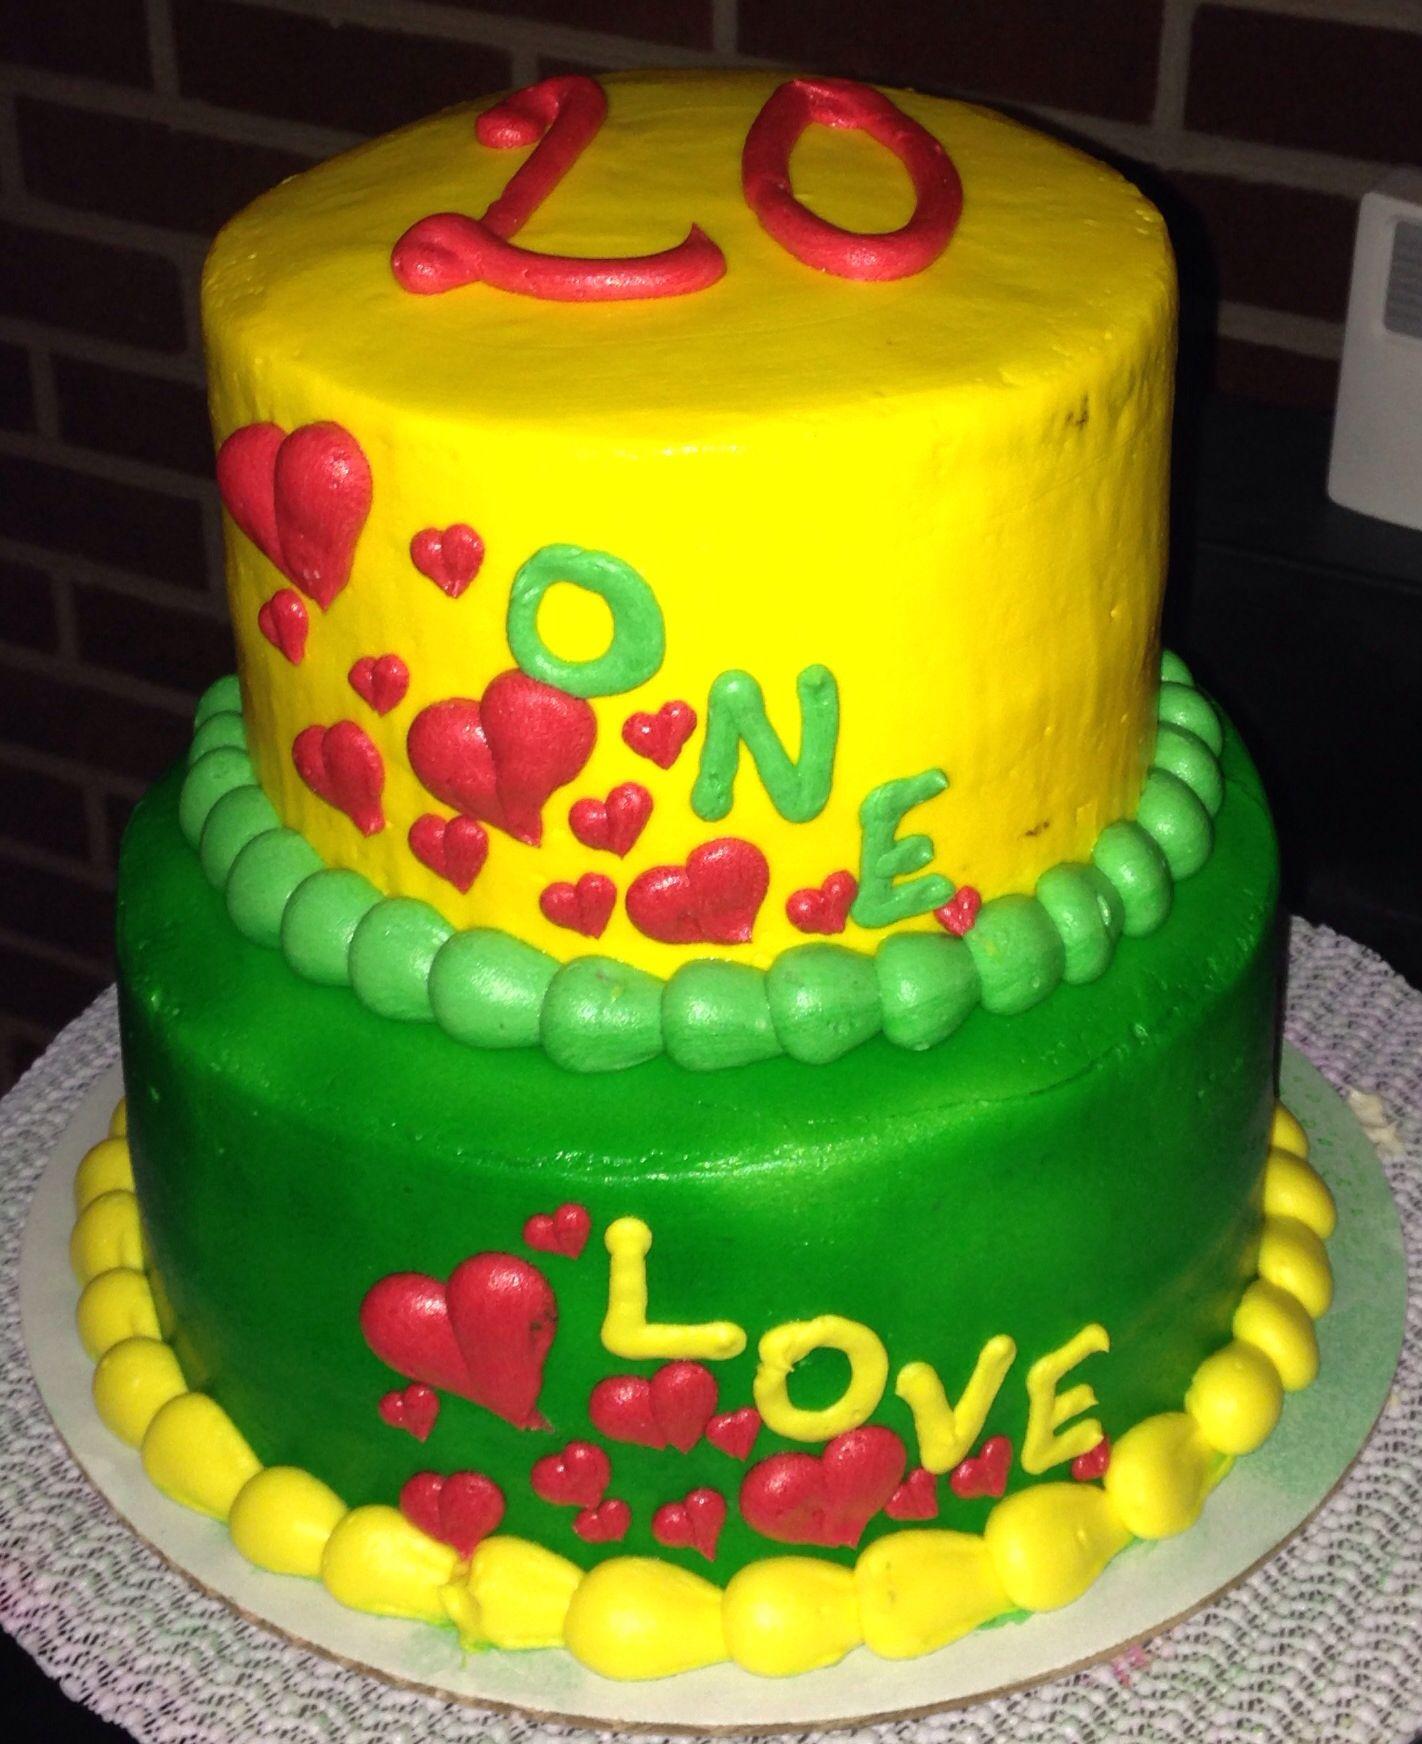 Rastafarian one love cake cakes Ive made Pinterest Cake